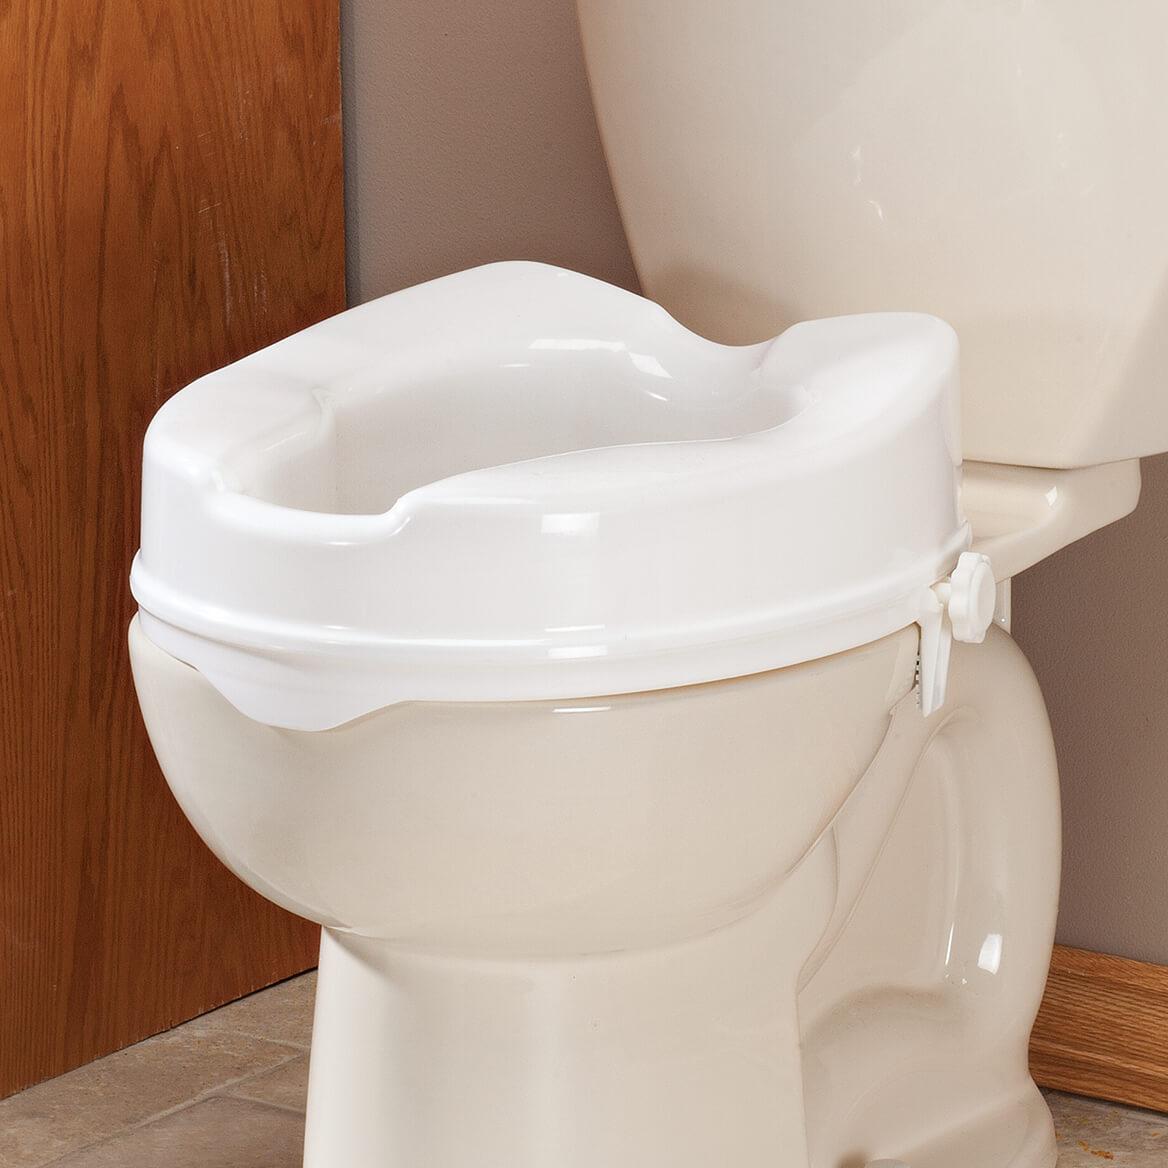 Cool Raised Toilet Seat Machost Co Dining Chair Design Ideas Machostcouk